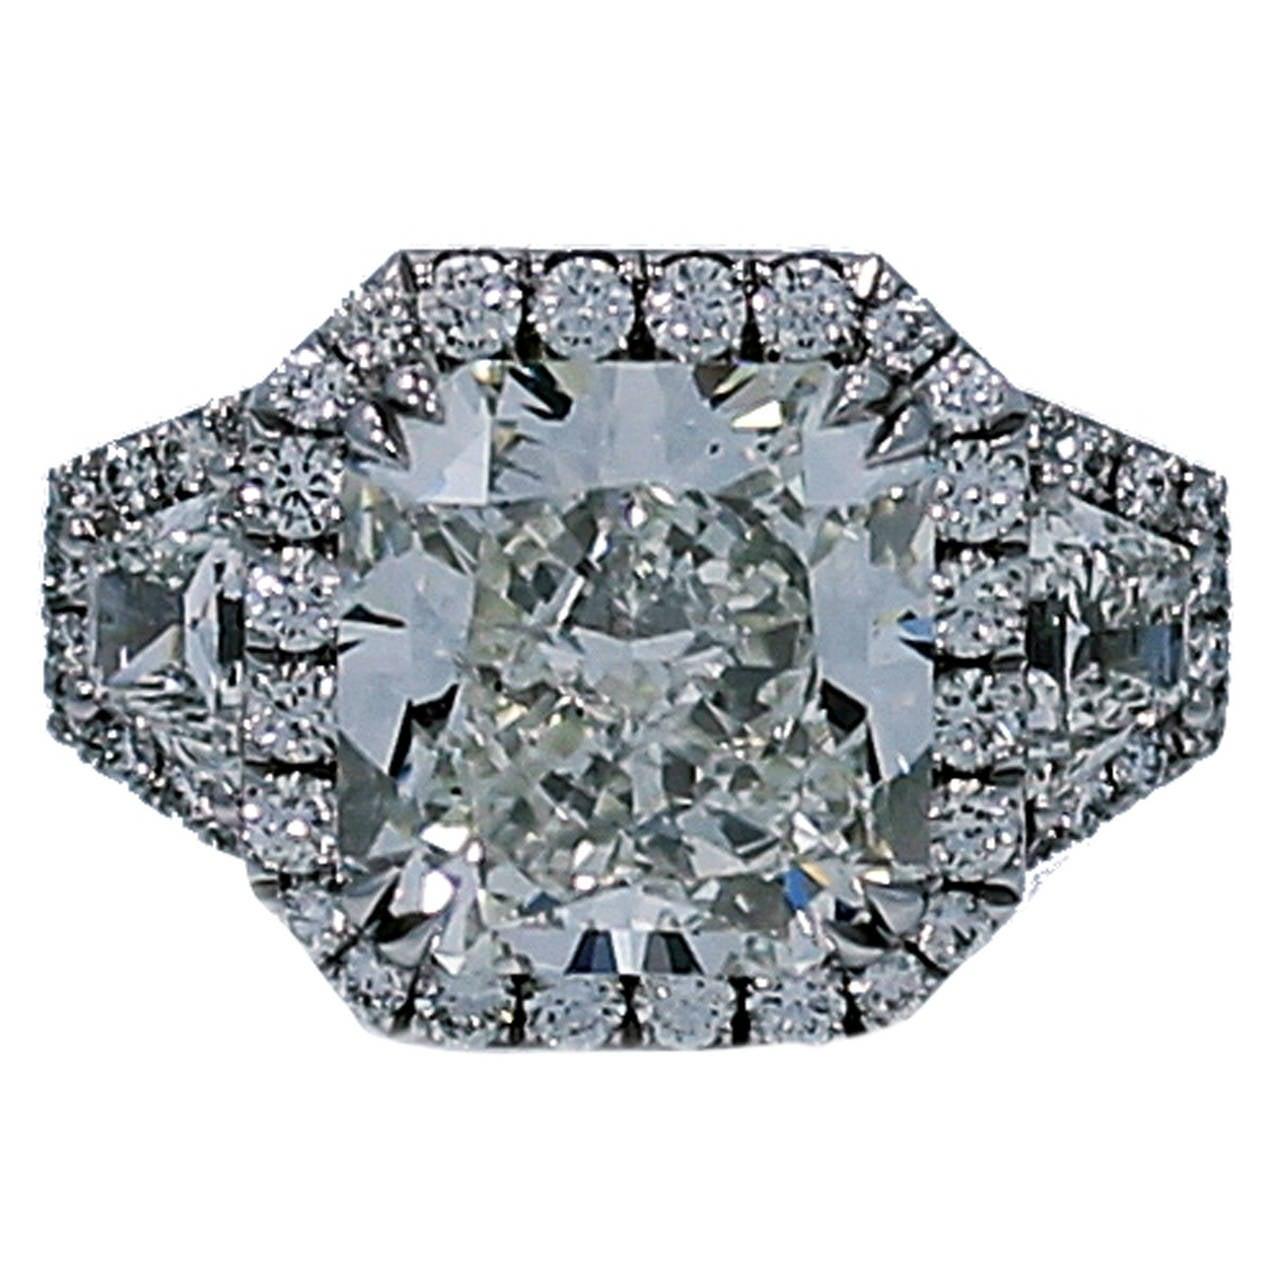 GIA Certified 8.56 Carat Radiant Cut Diamond Engagement Ring